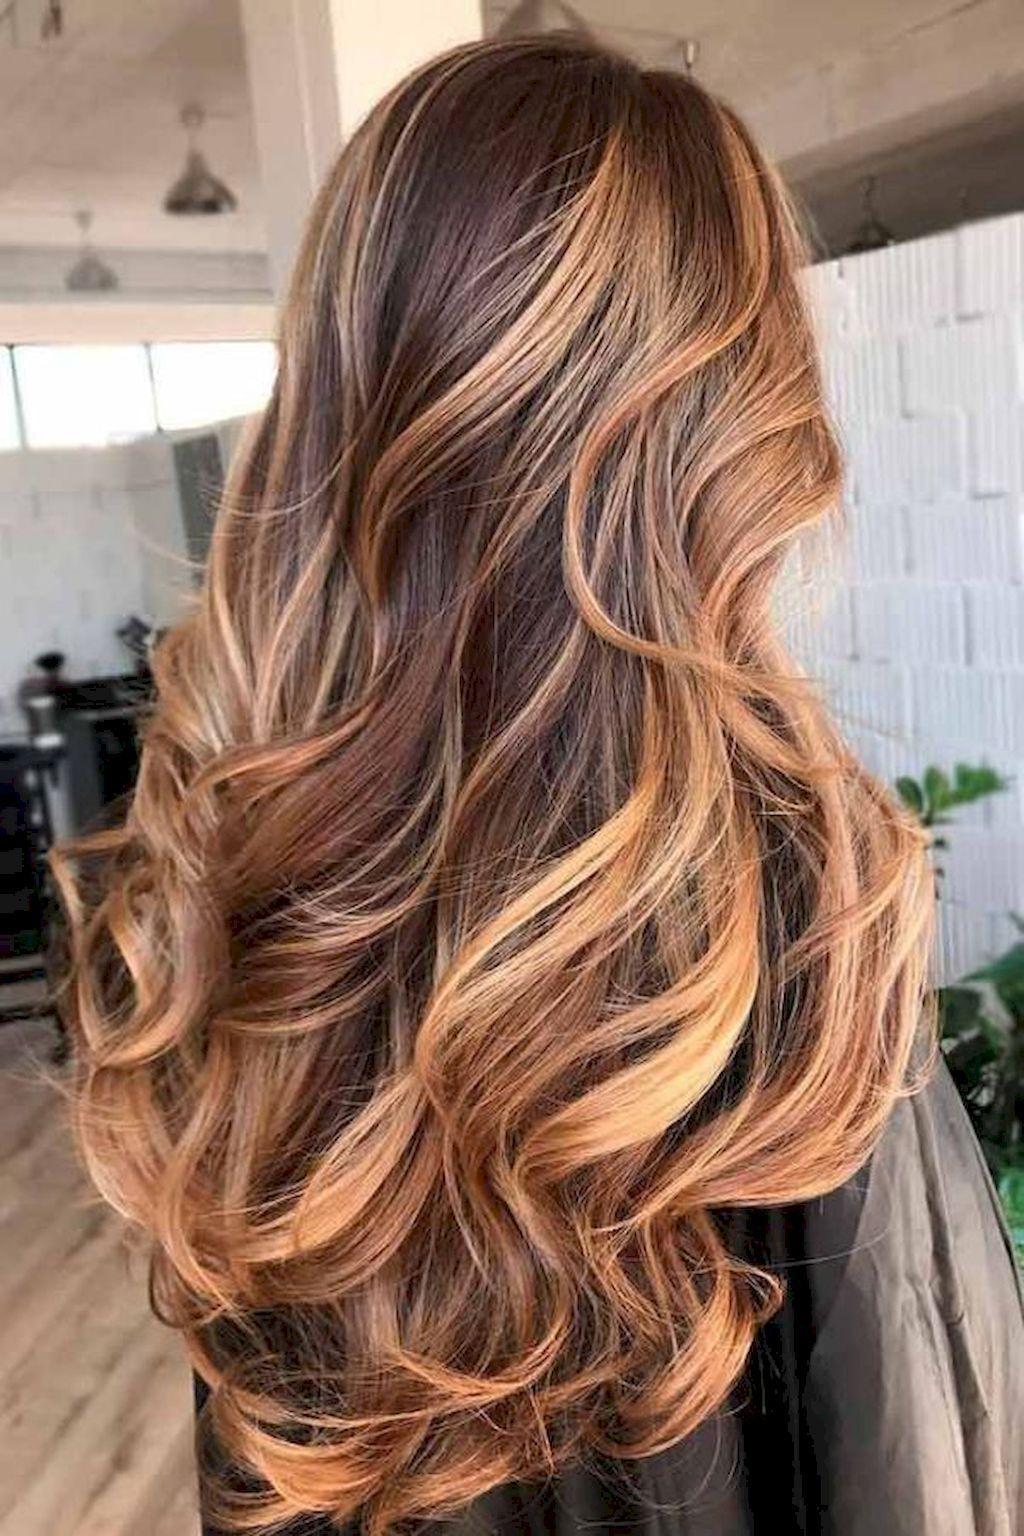 33 Cute Ideas To Spice Up Light Brown Hair Ideas Spring Hair Color Hair Styles Long Hair Styles